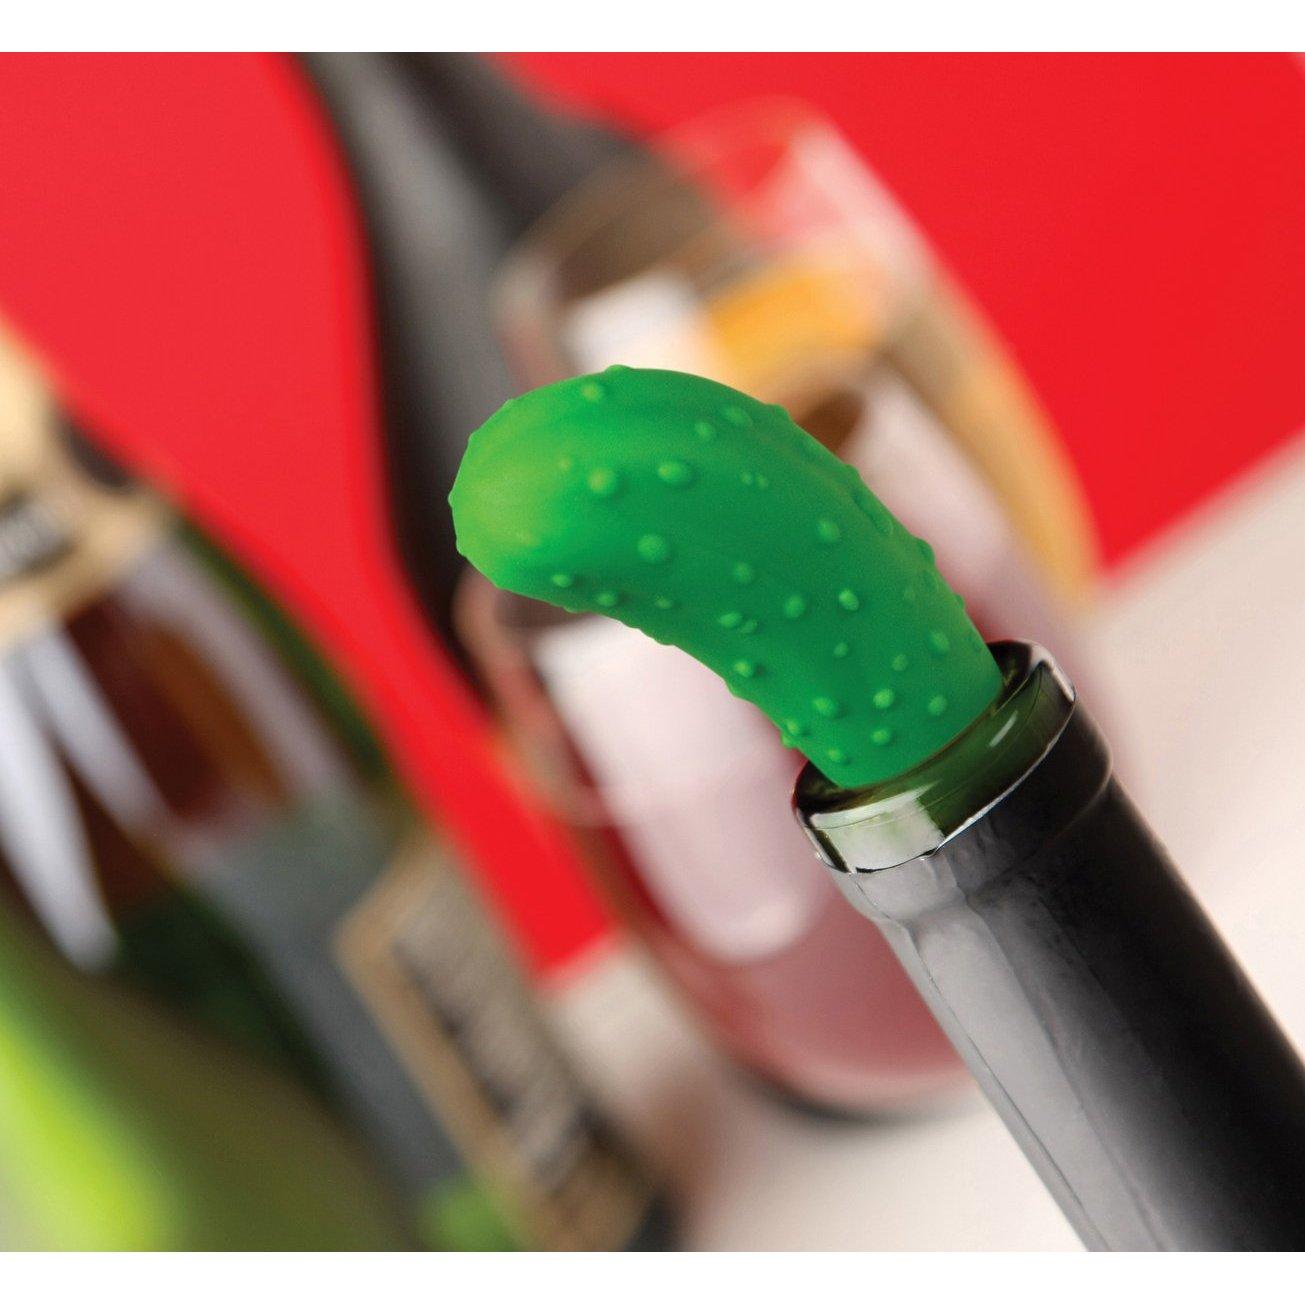 Pickle stopper bottle